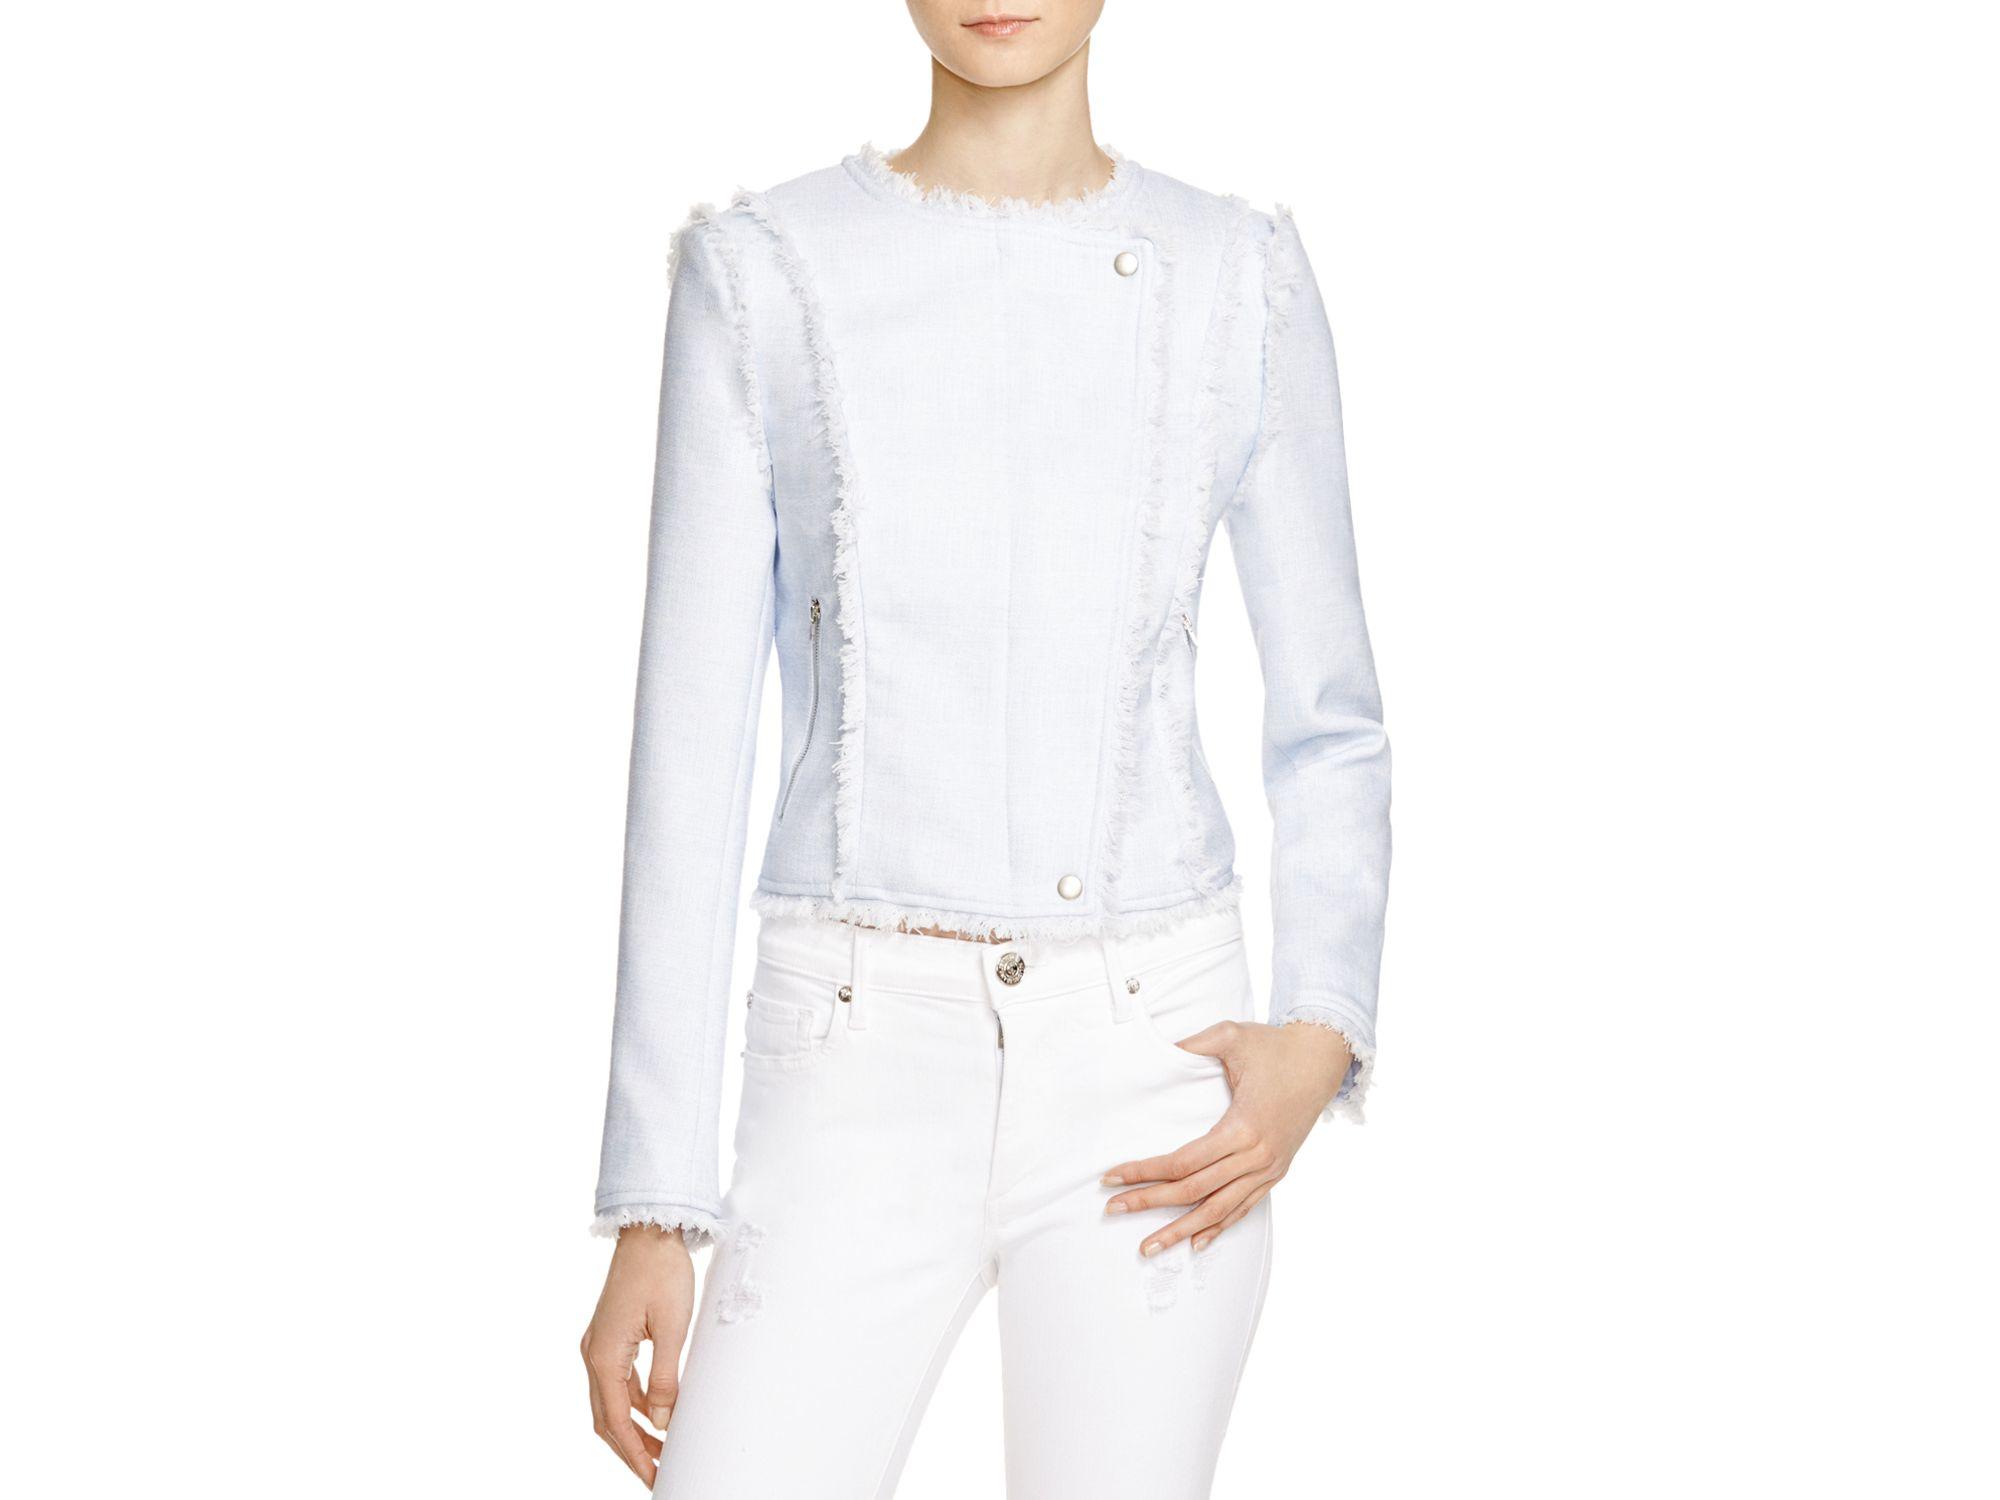 Los angeles Cowl Neck Asymmetric Hem Snap Front Plain Batwing Sleeve Cardigans maxx sale